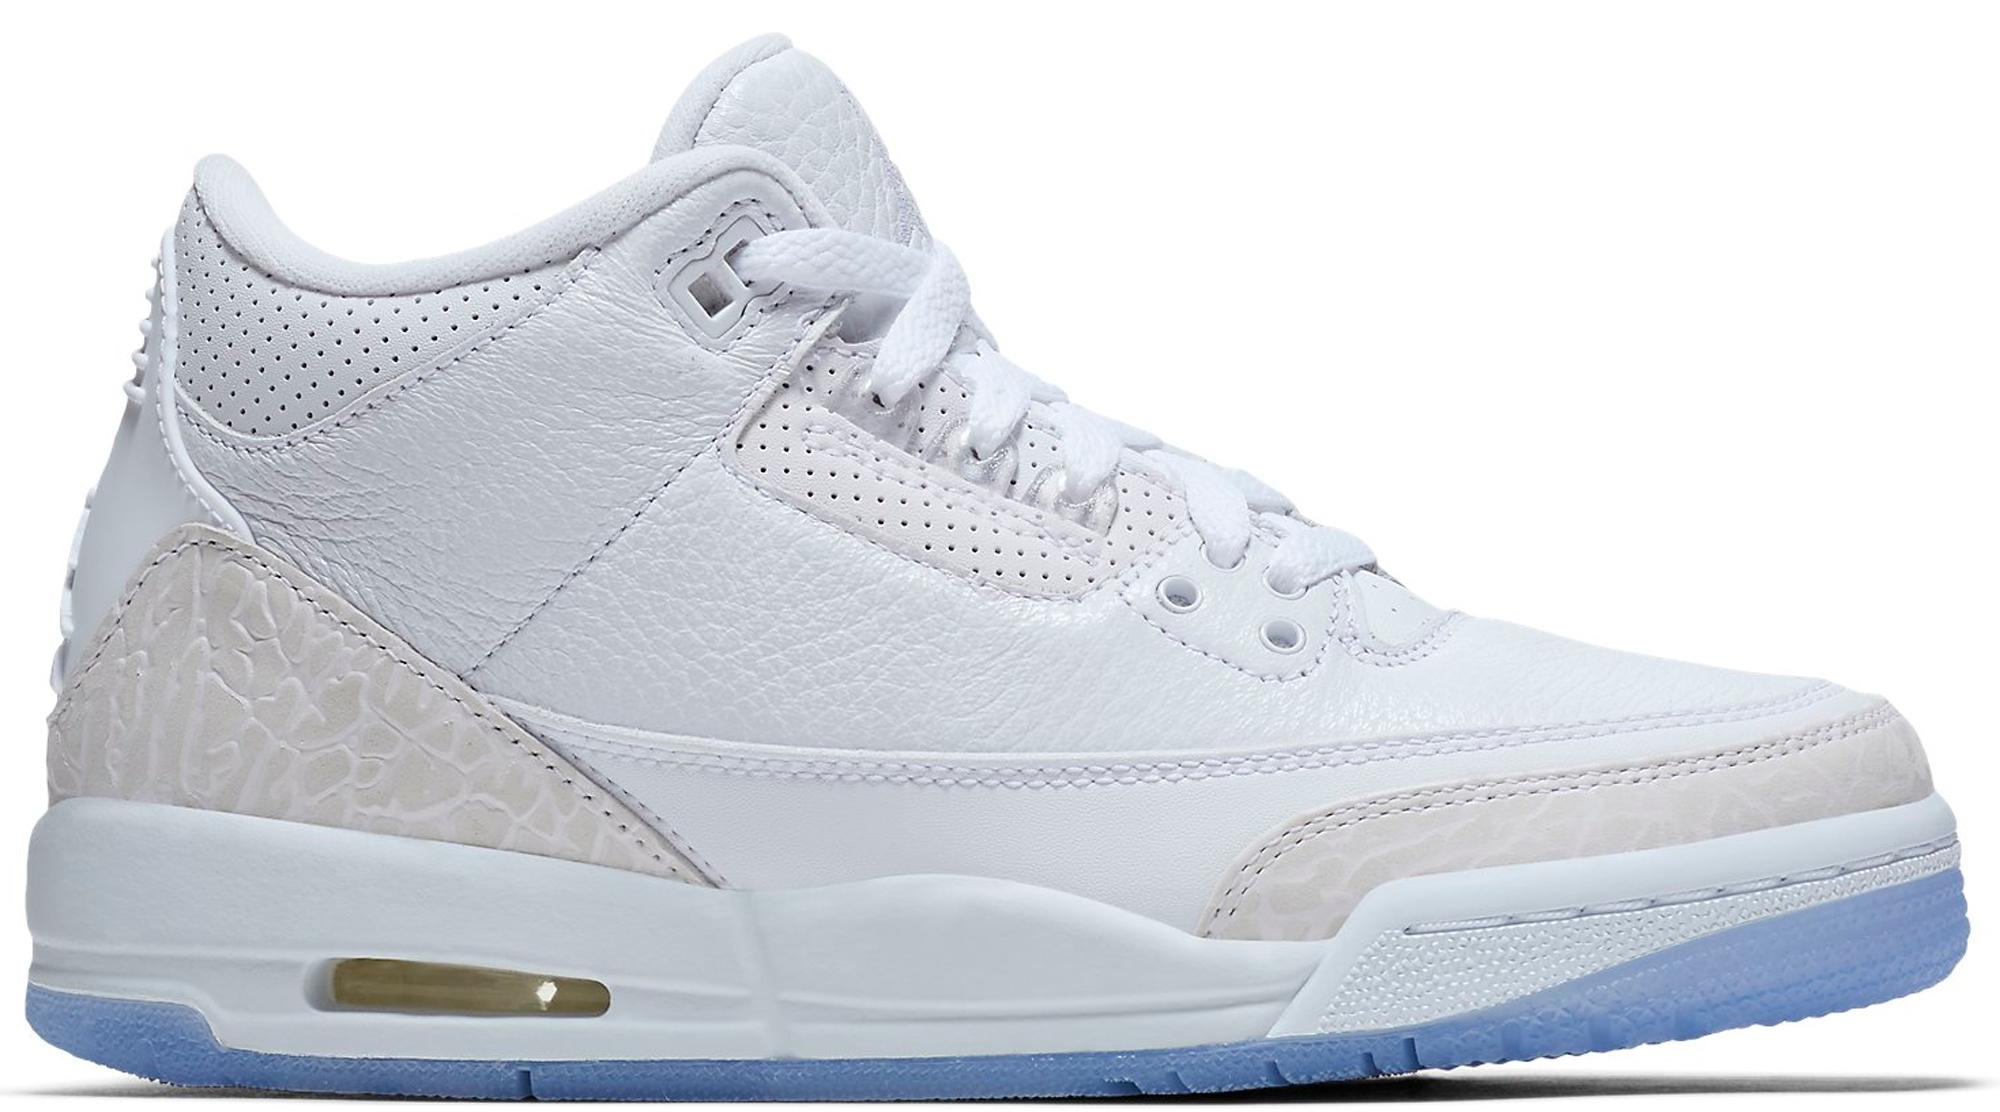 Jordan 3 Retro Pure White 2018 (GS